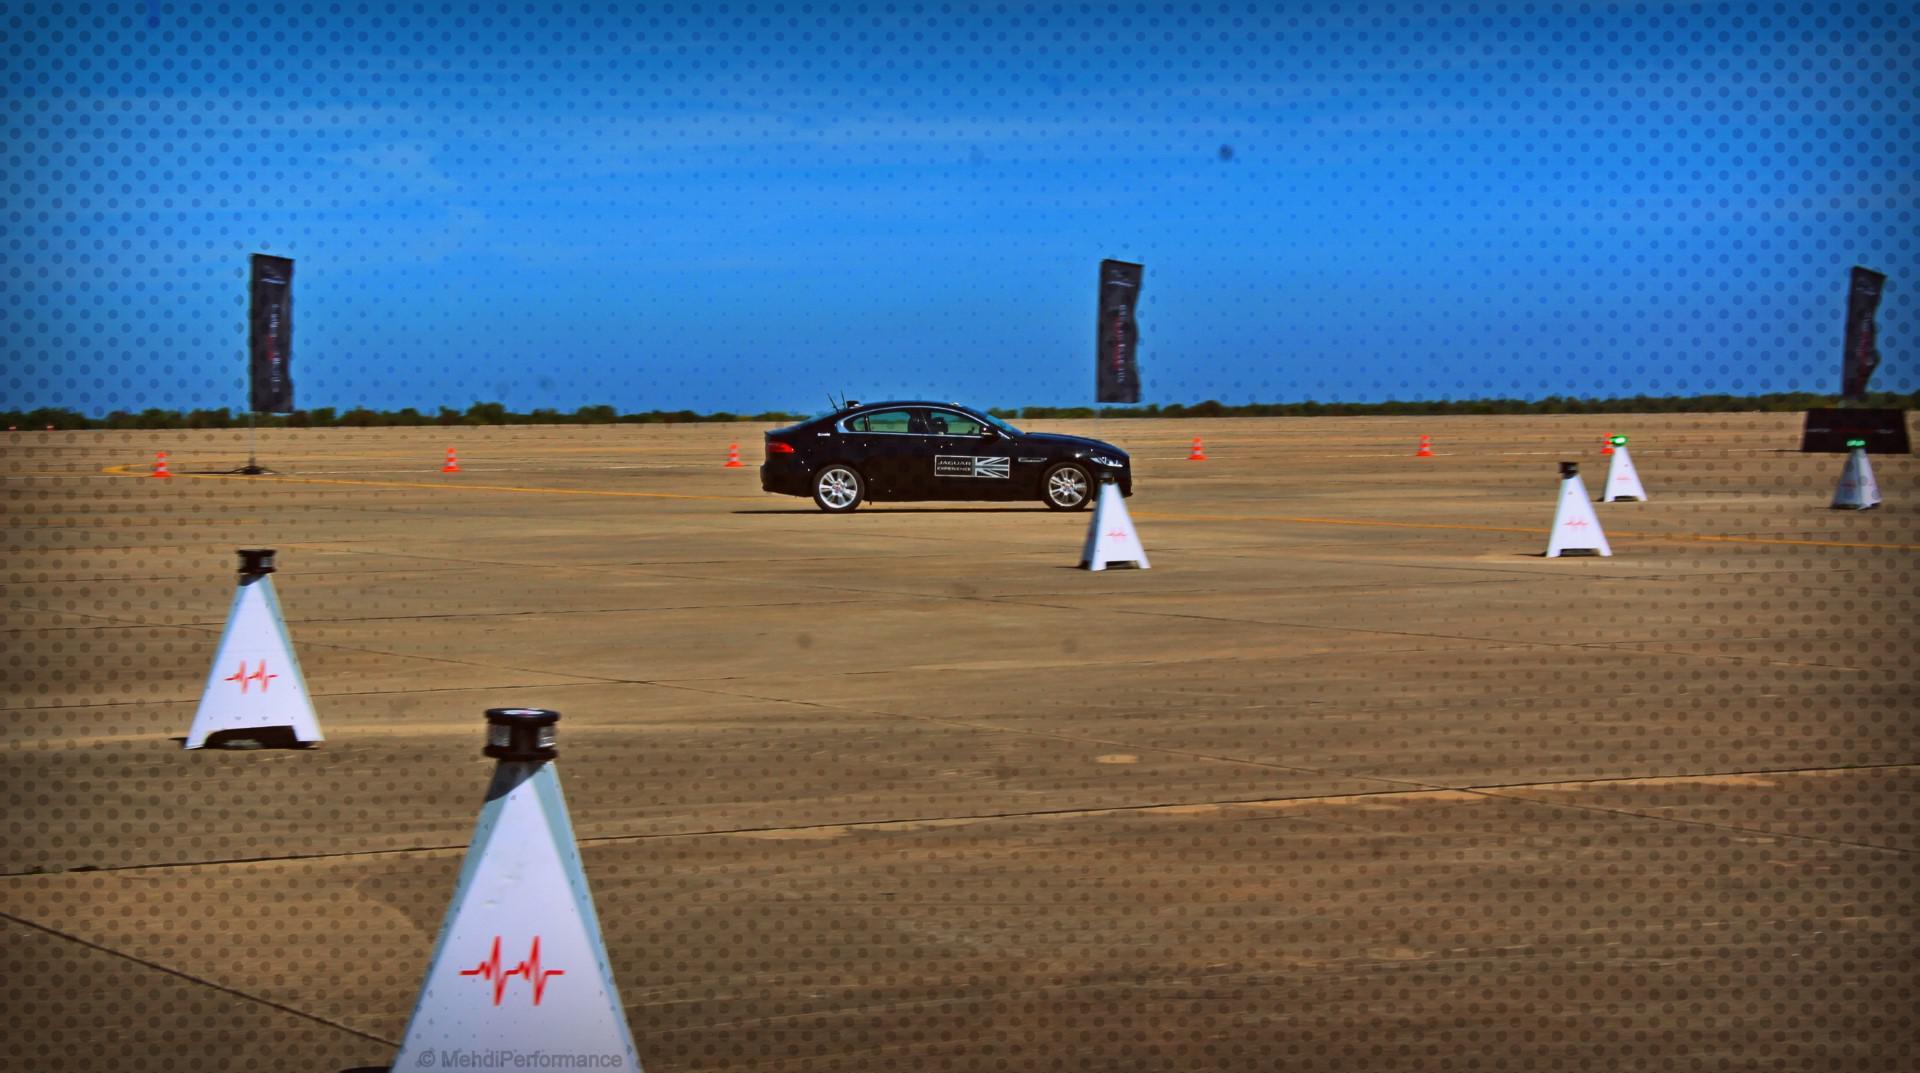 jaguar-amp-land-rover-experience-734-3.jpg